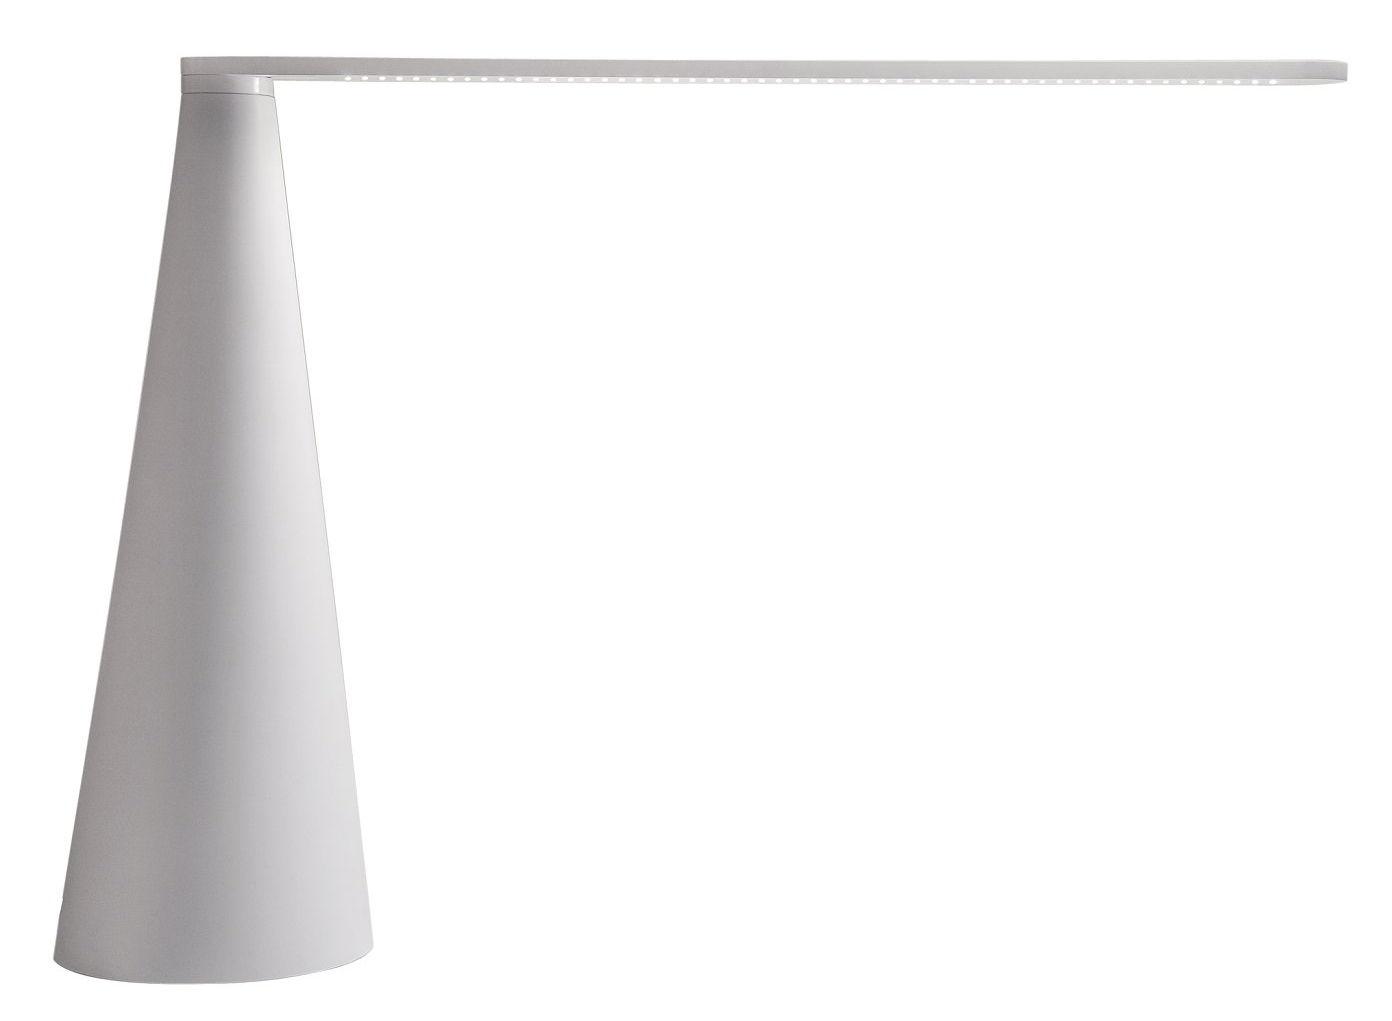 lampe de table elica grand mod le h 52 cm blanc martinelli luce. Black Bedroom Furniture Sets. Home Design Ideas